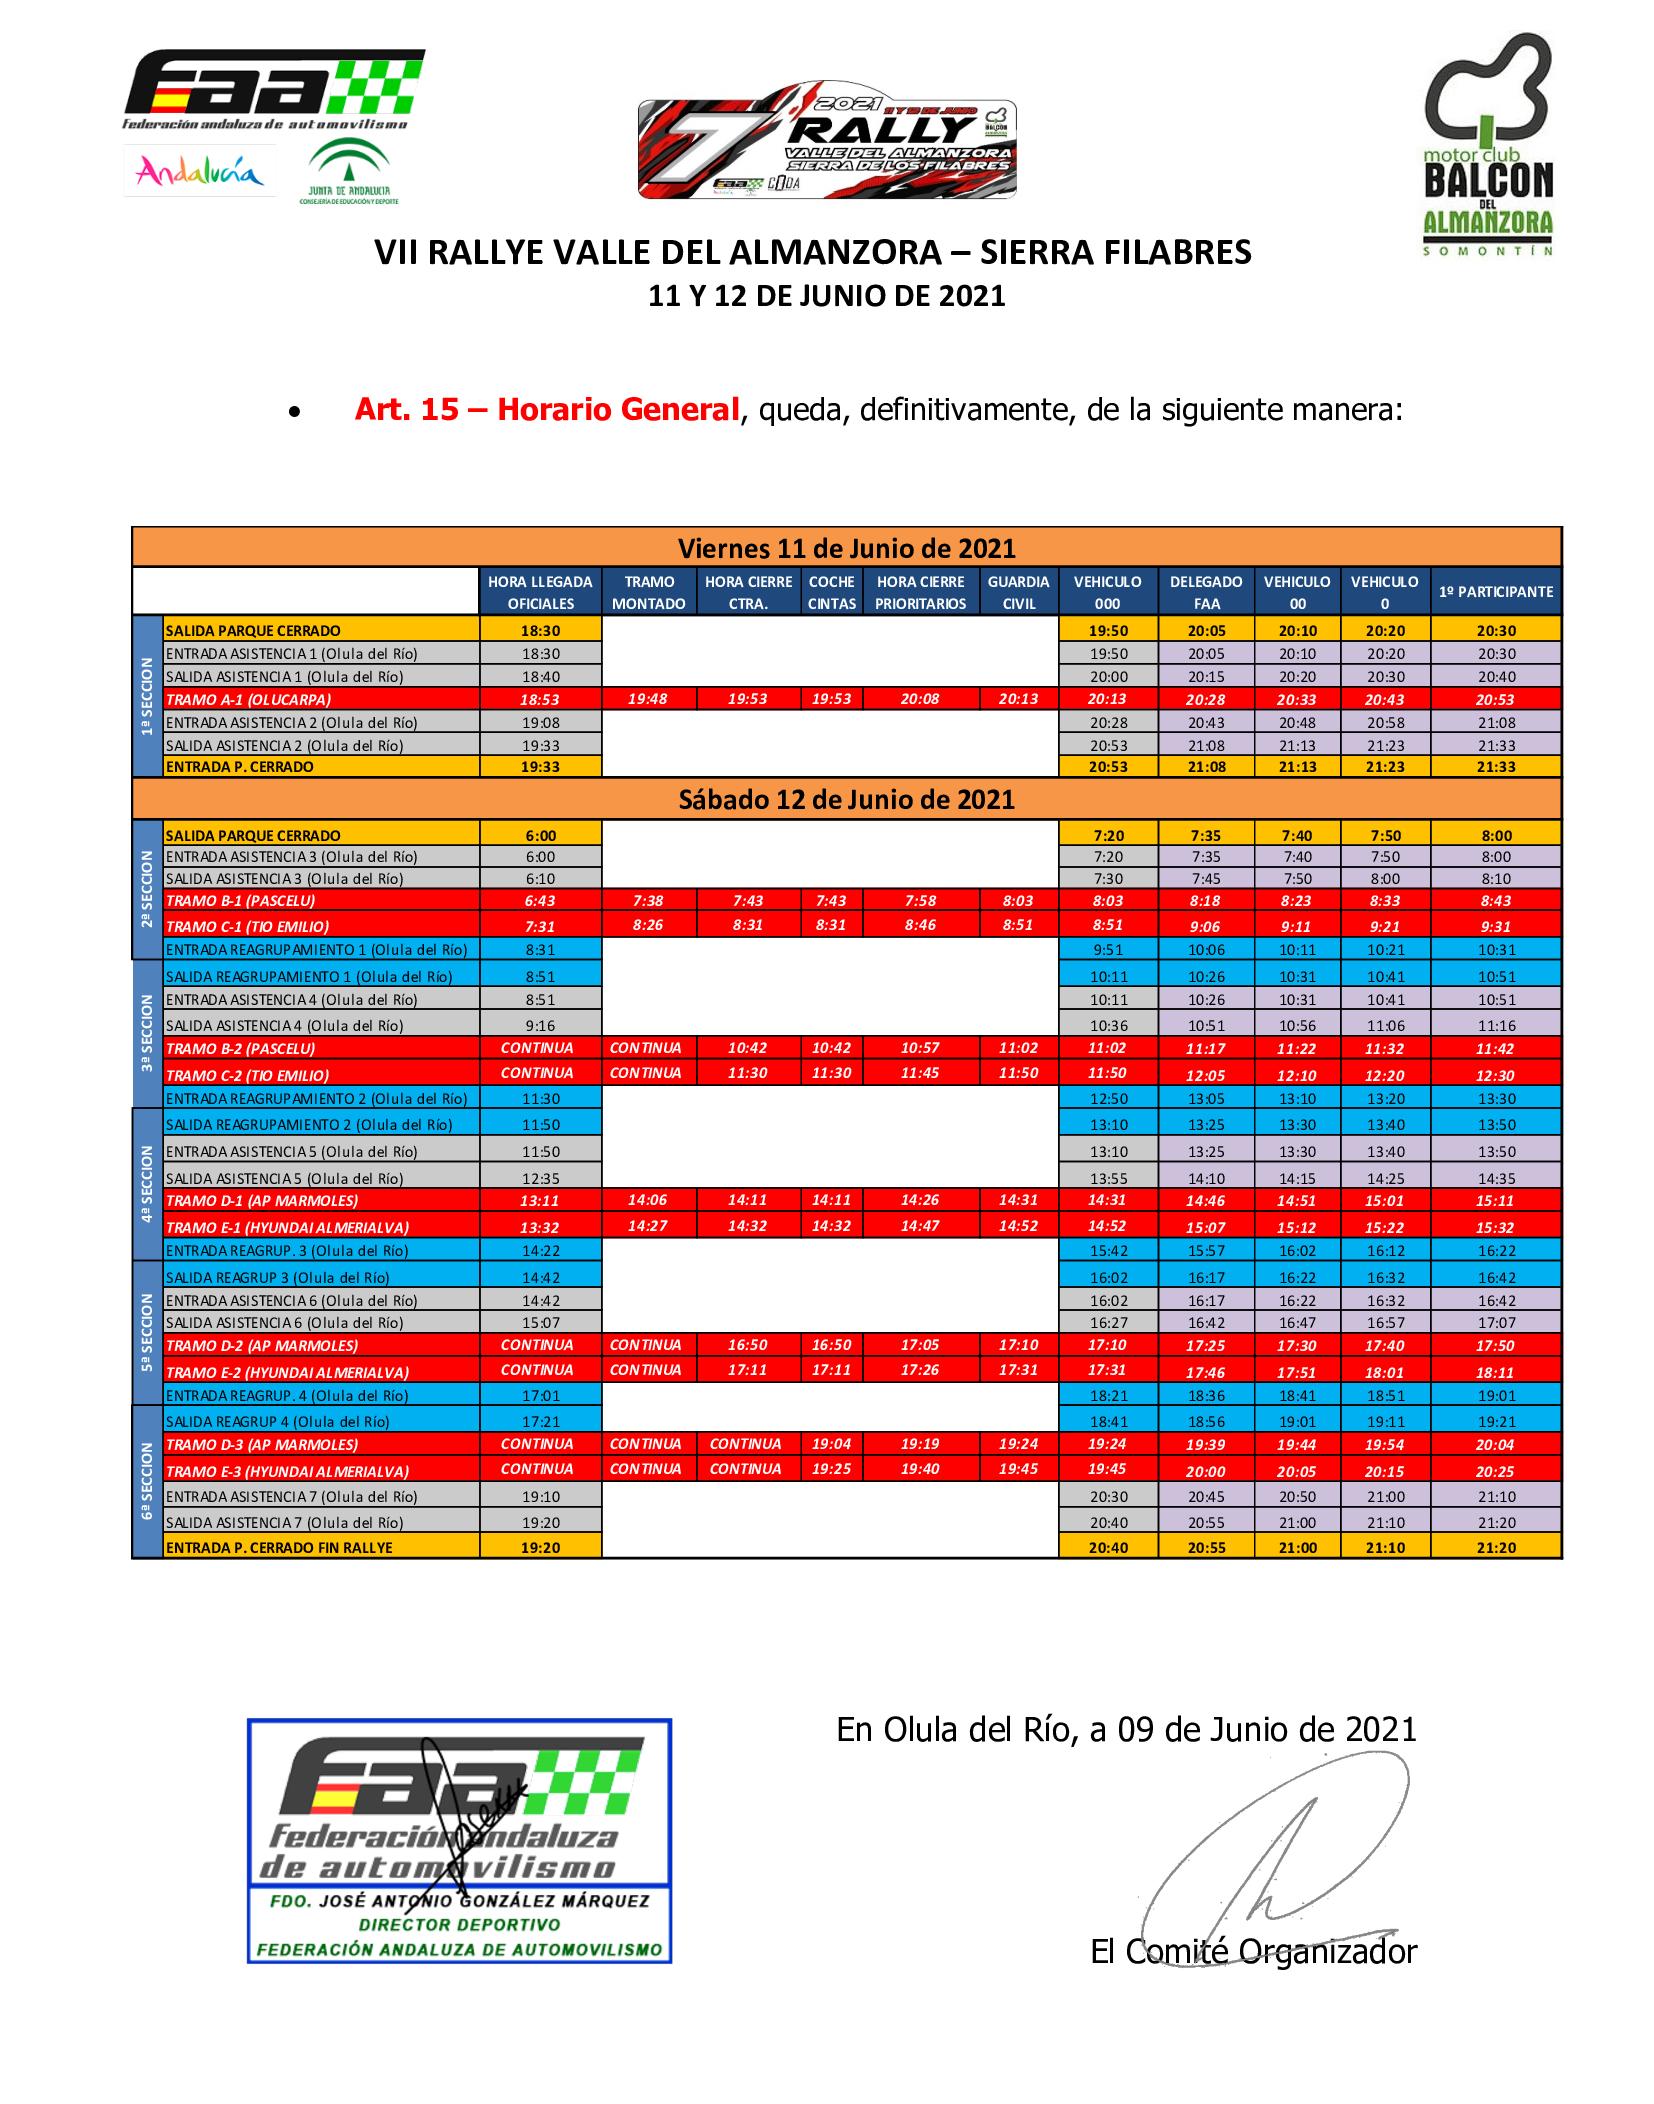 Cuadro horario VII Rallye Valle del Almanzora - Filabres